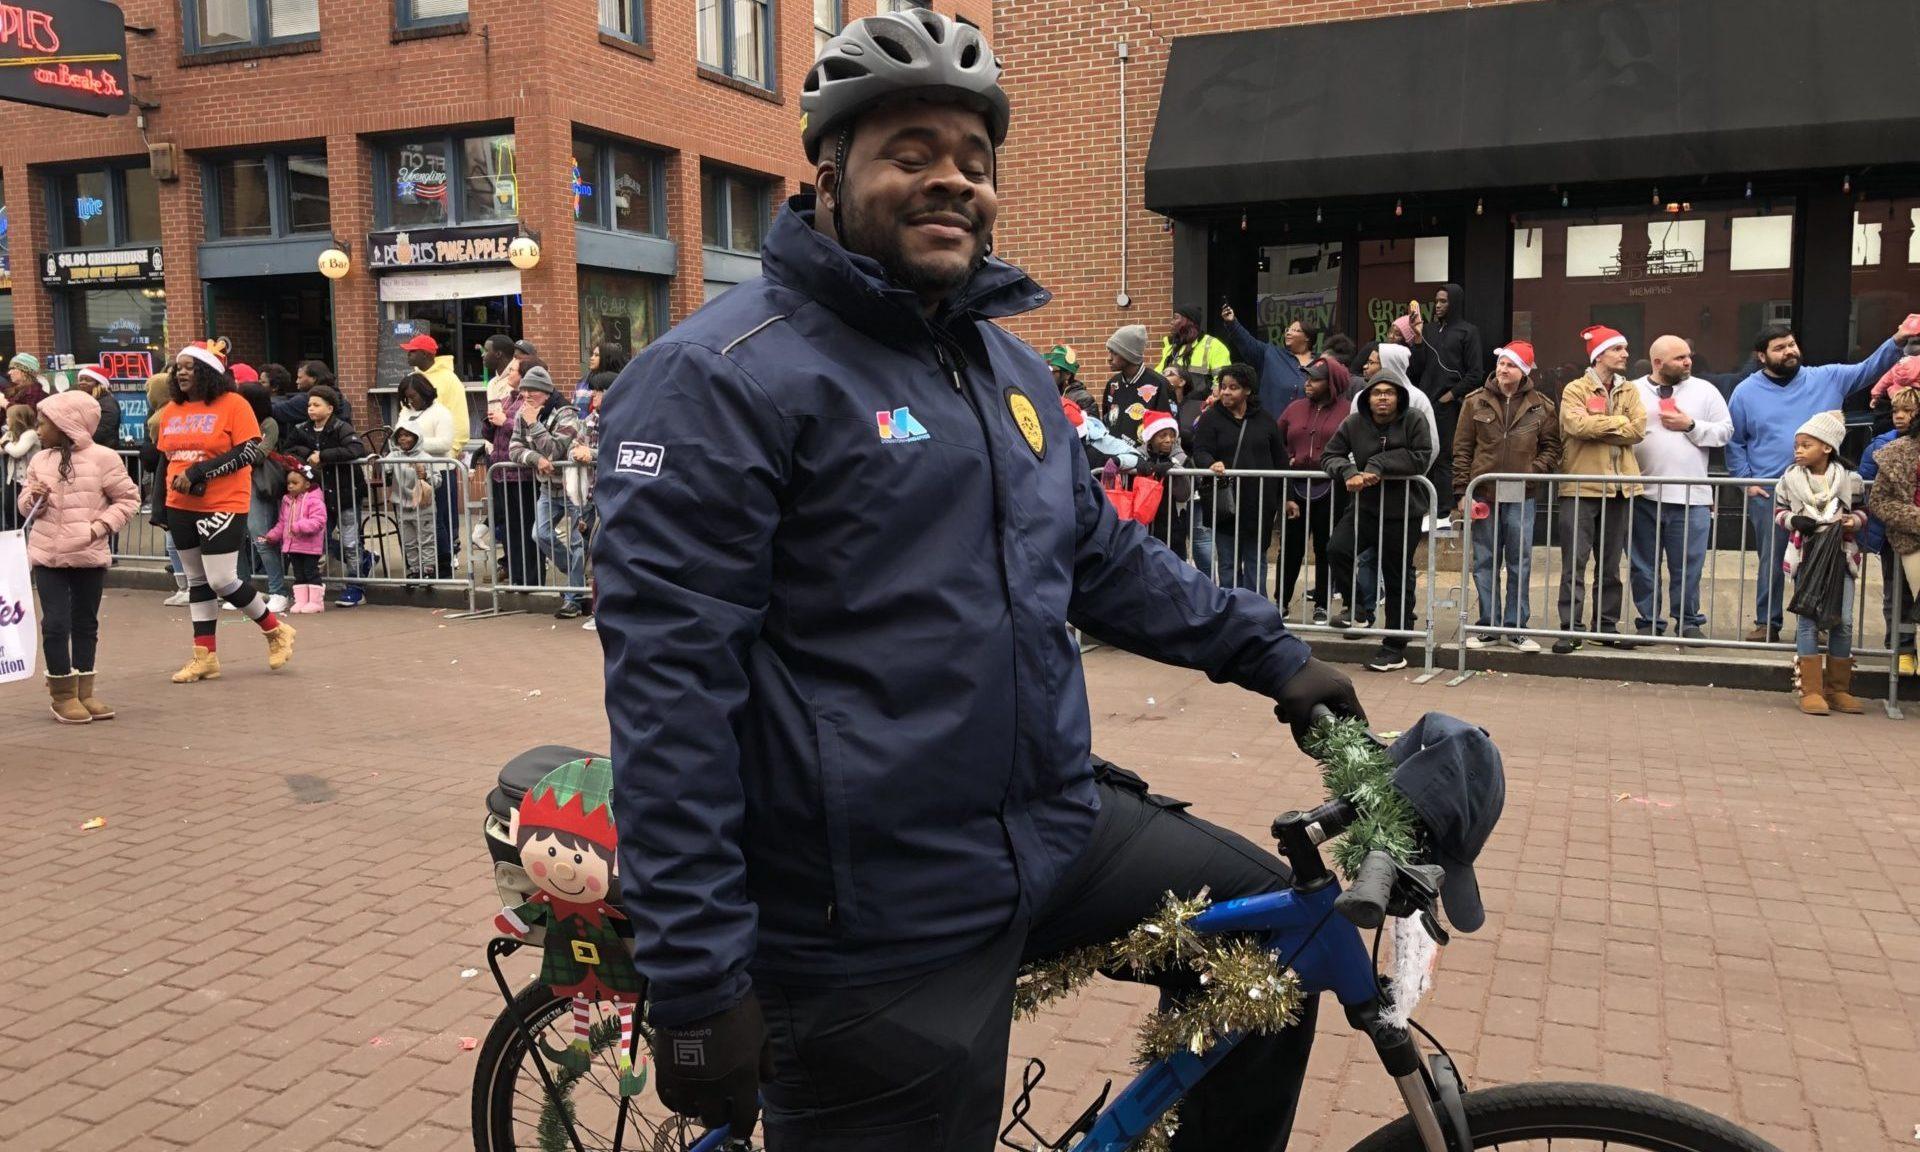 Blue Suede brigade member patrol on bike Beale Street Holiday Parade, Downtown Memphis